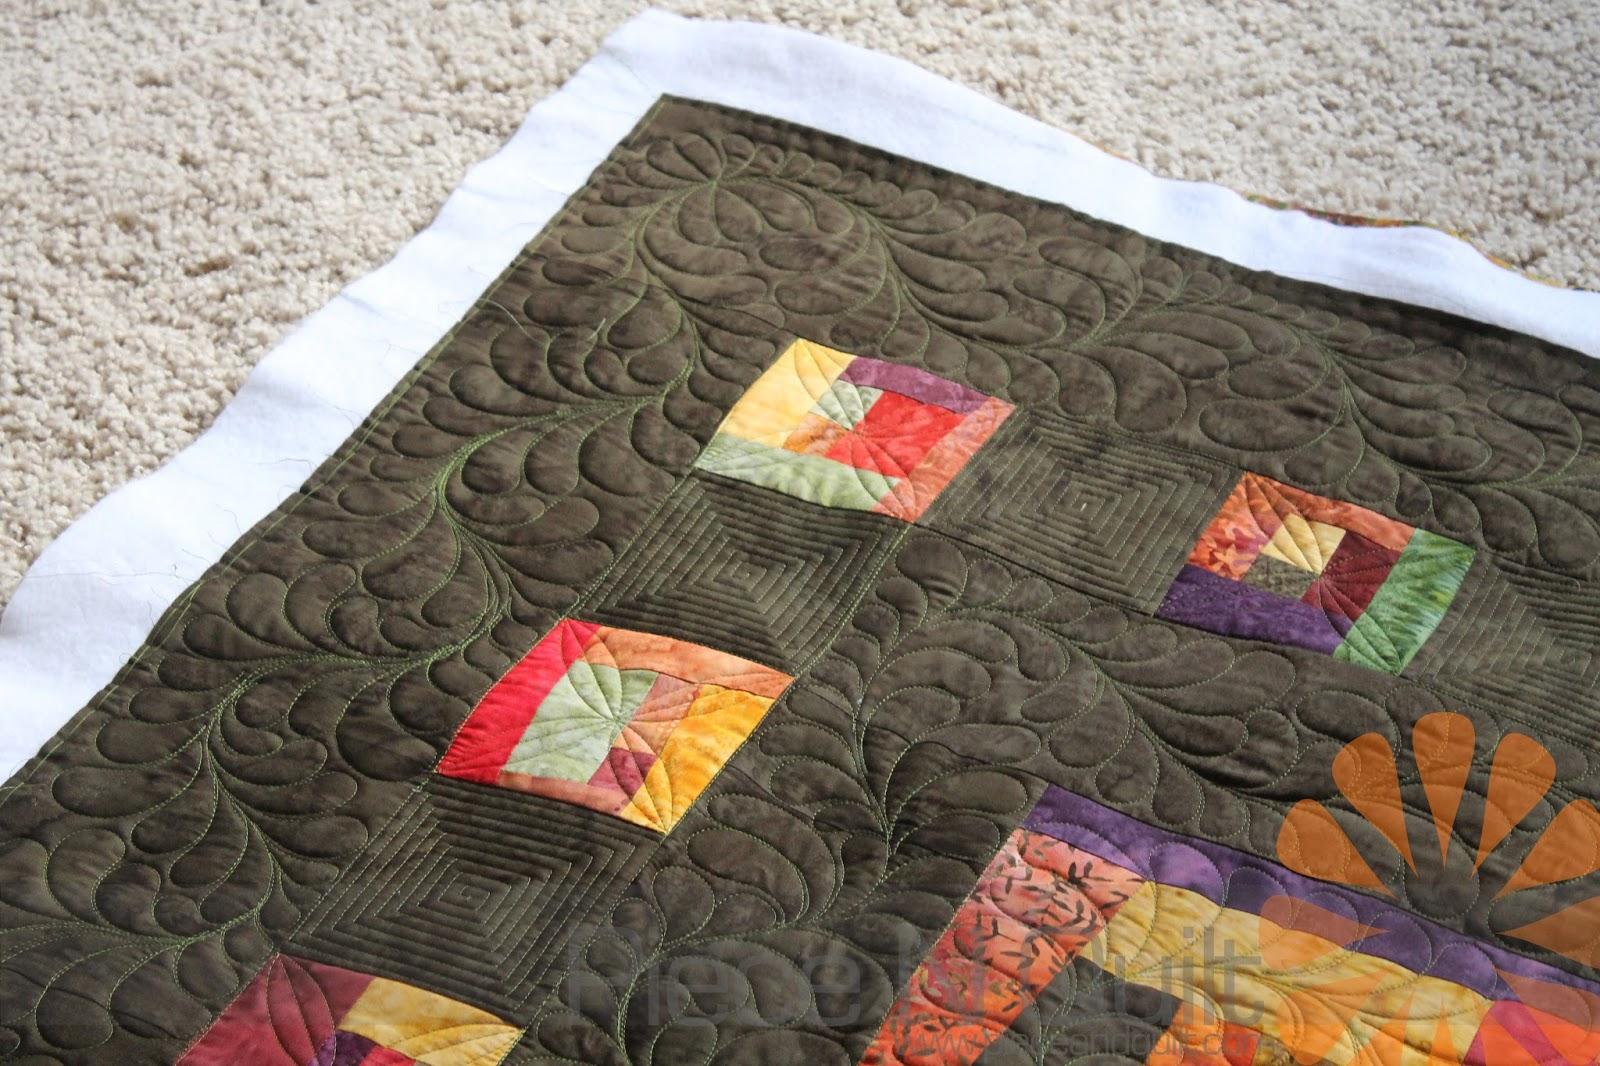 Piece N Quilt: Machine Quilting Feathers by Natalia Bonner : piece n quilt - Adamdwight.com